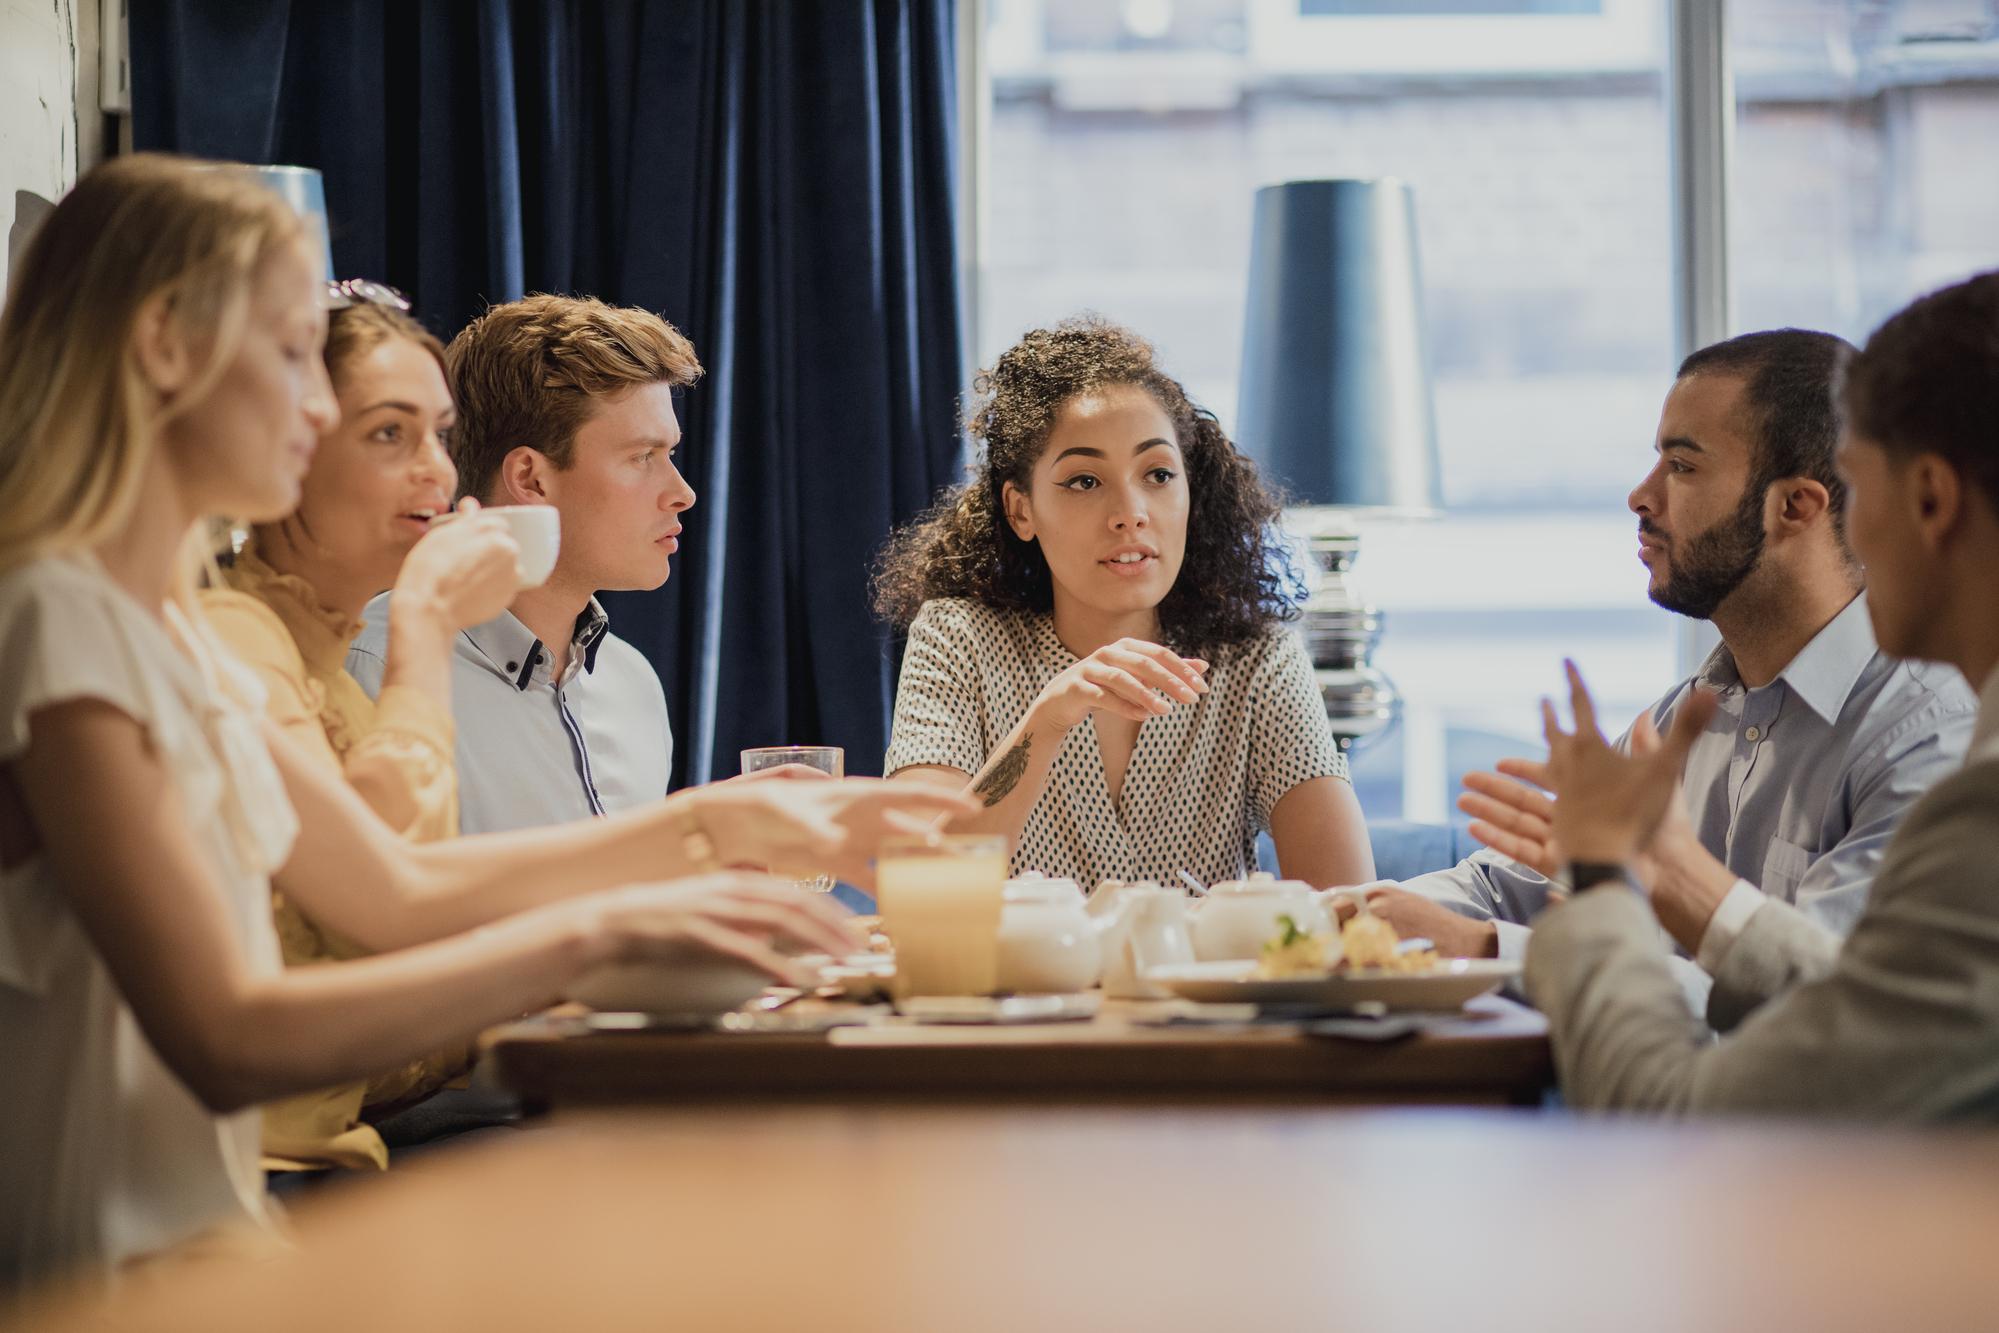 Are HR Leaders More People-Focused or Business-Focused?